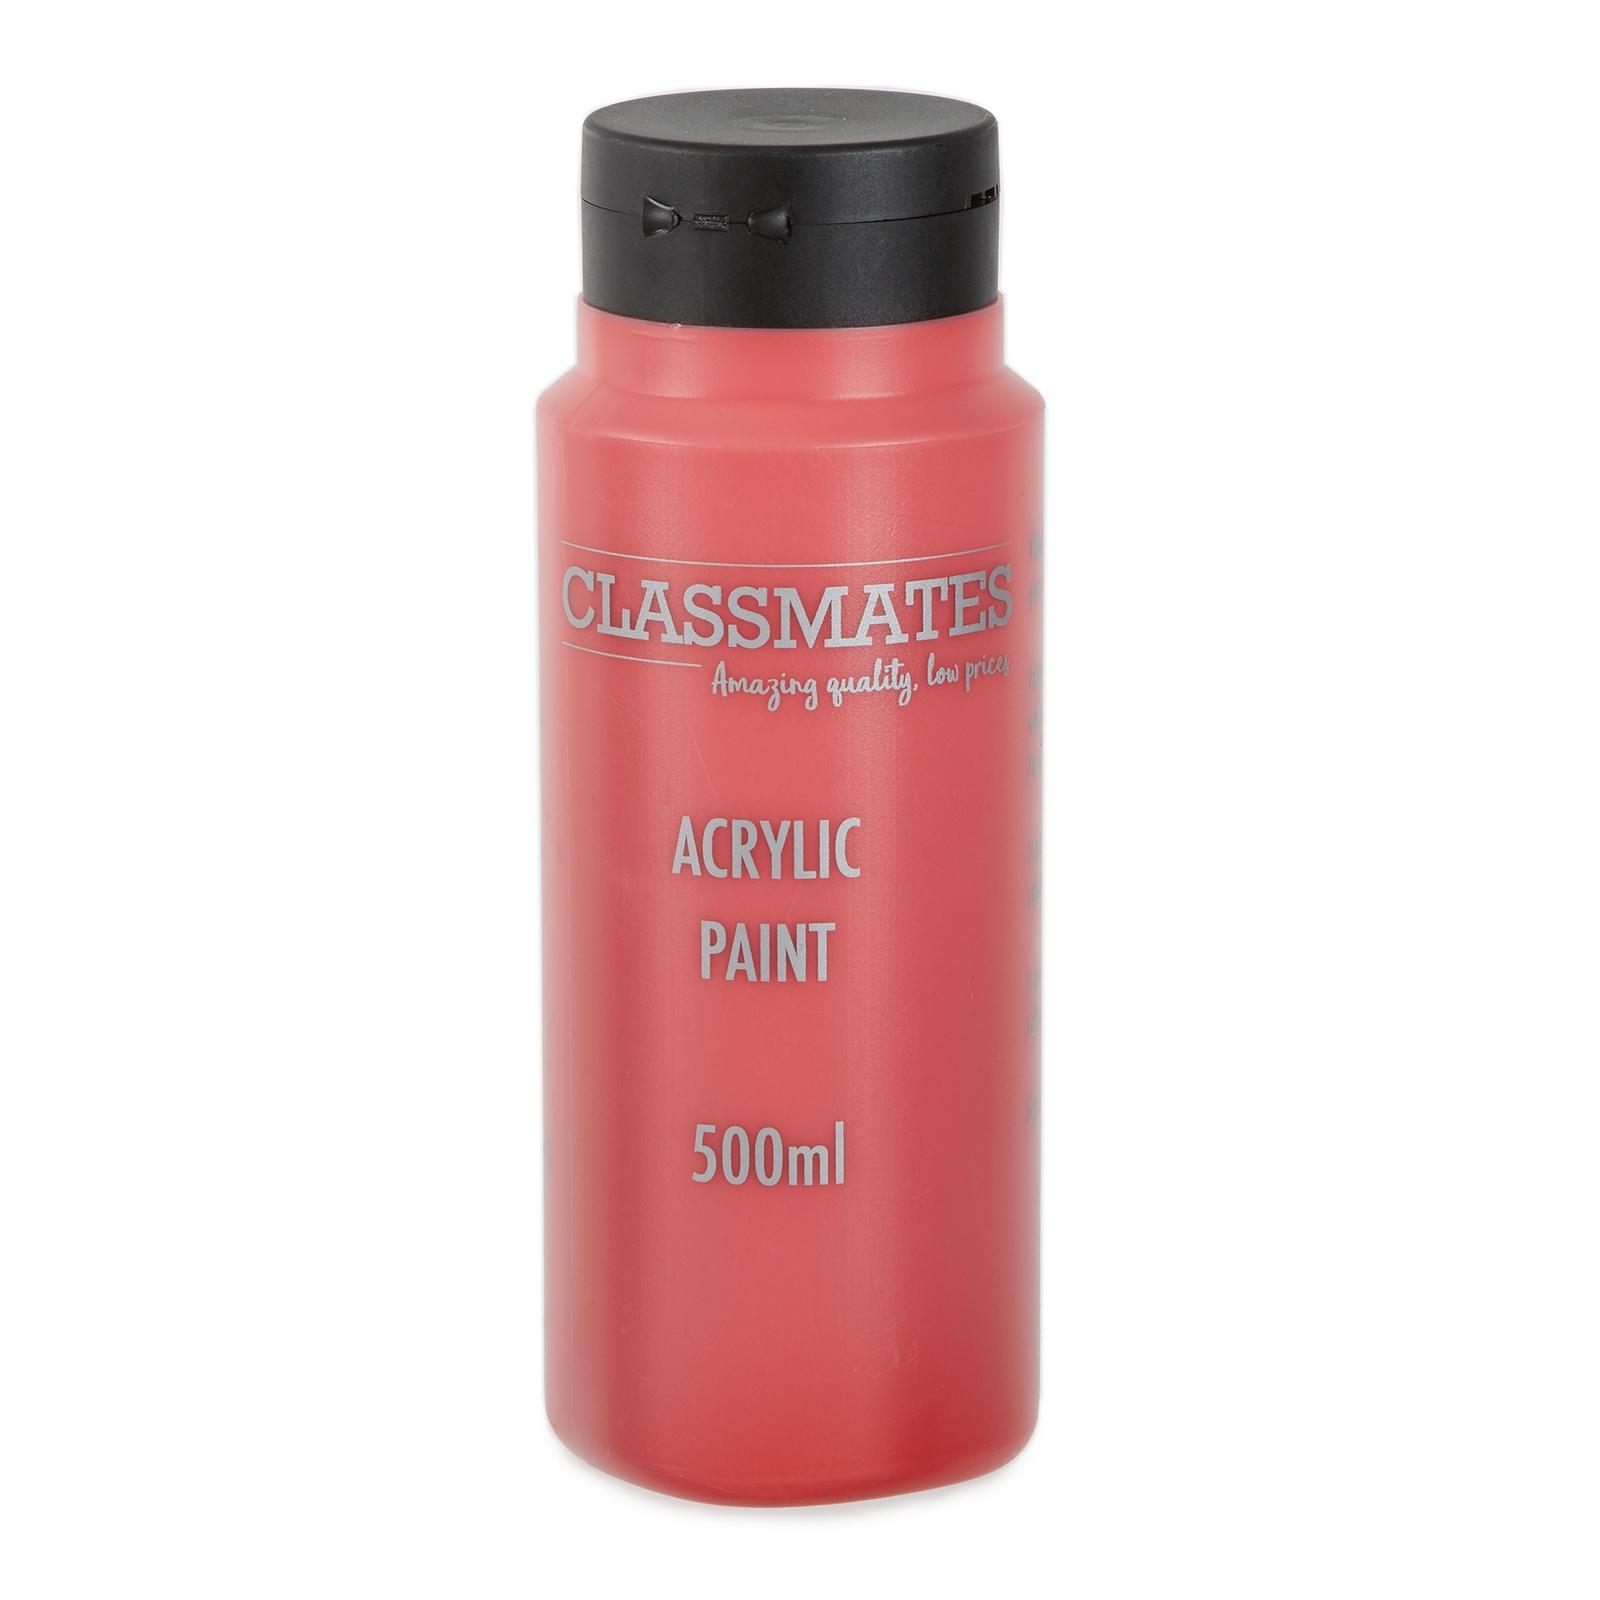 Classmates Acrylic Paint In Scarlet Red 500ml Bottle